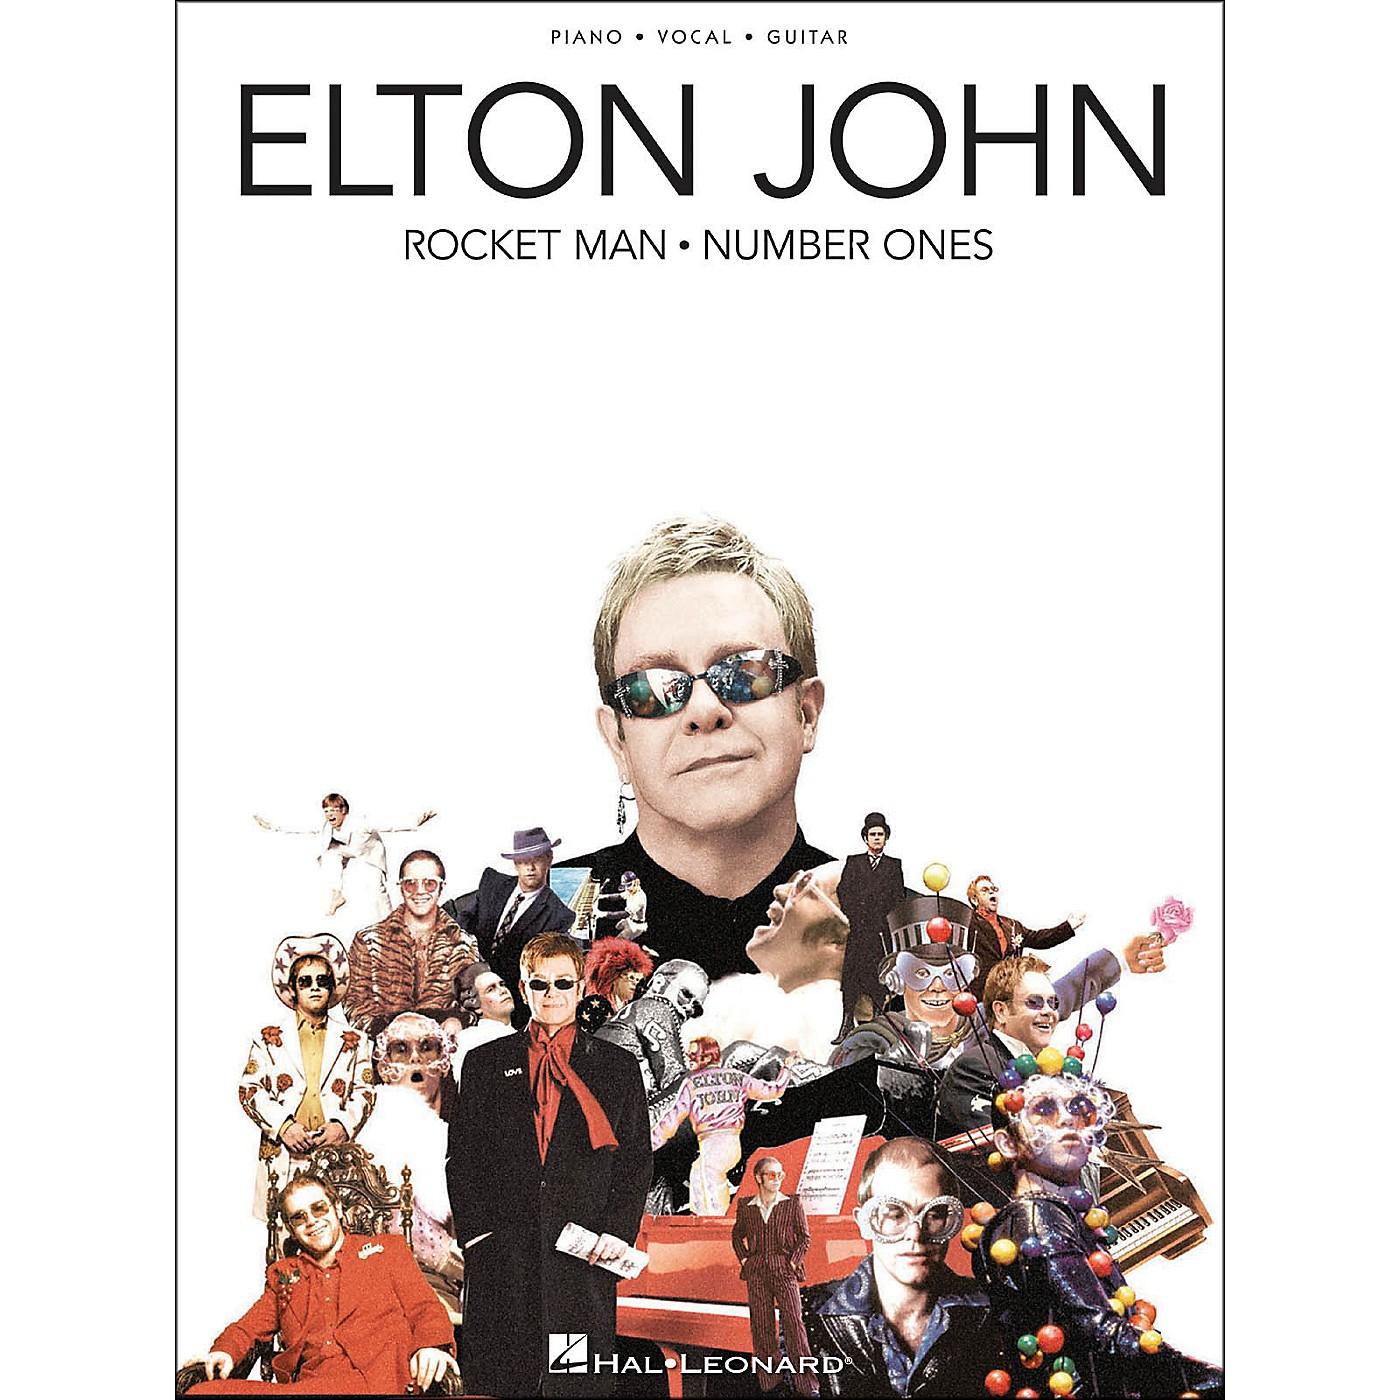 Hal Leonard Elton John Rocket Man Number Ones arranged for piano, vocal, and guitar (P/V/G) thumbnail